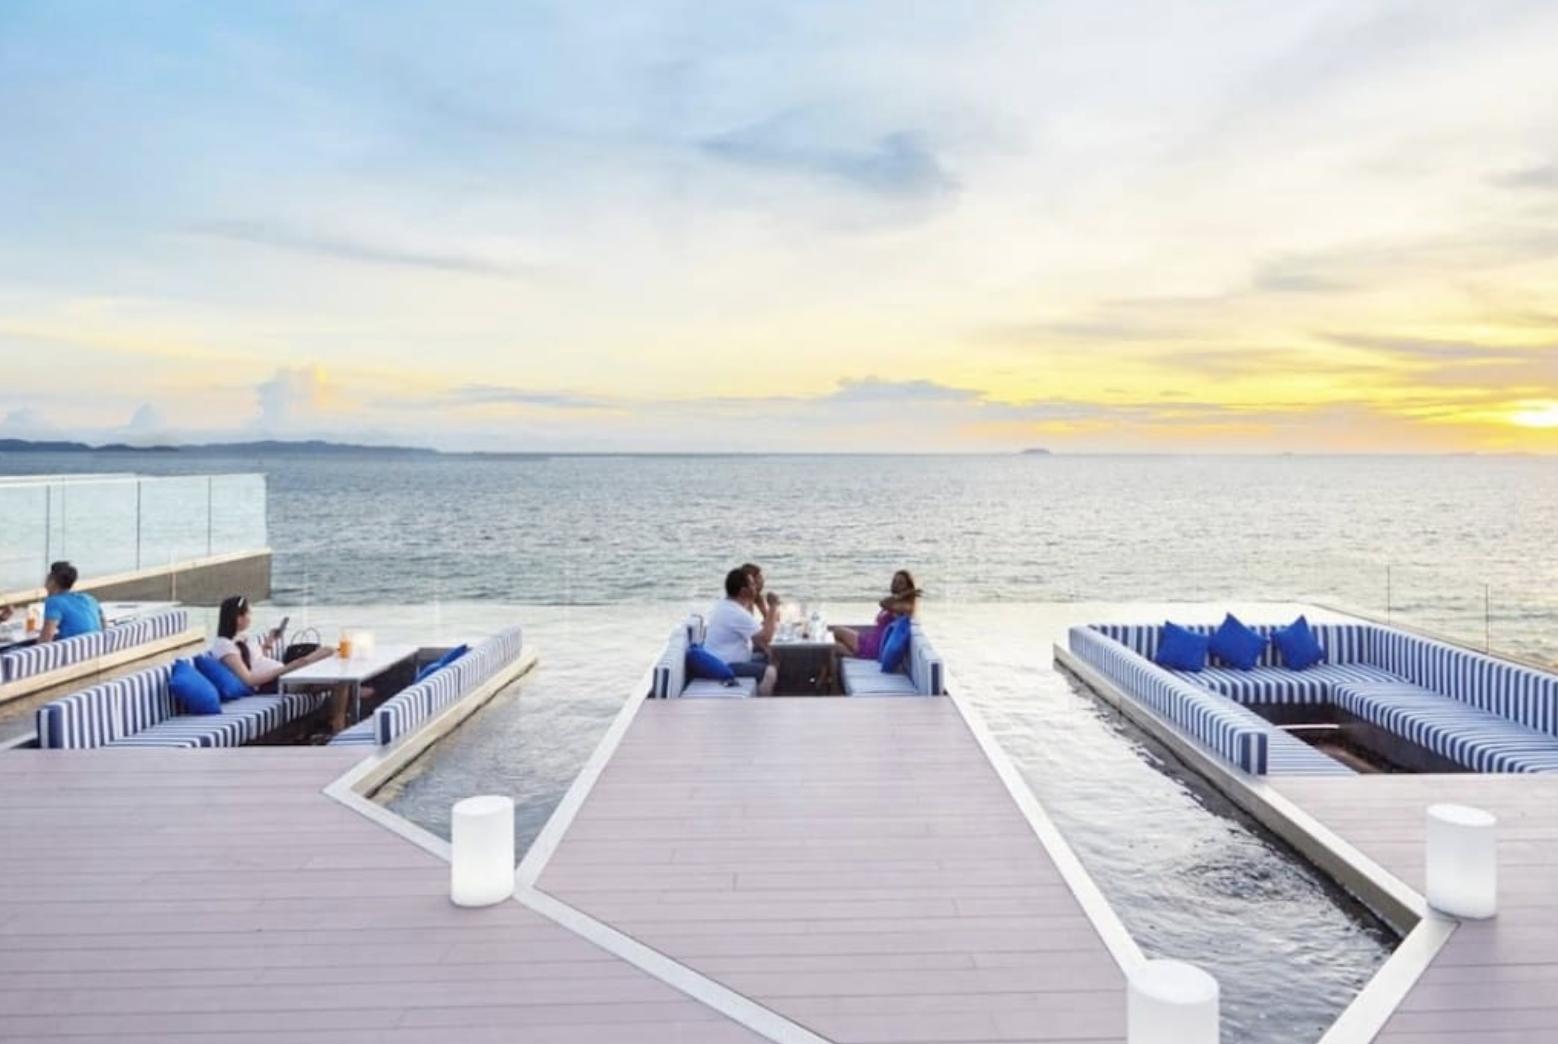 Large 3 Bedroom in Beautiful Veranda - Sea Views อพาร์ตเมนต์ 3 ห้องนอน 3 ห้องน้ำส่วนตัว ขนาด 126 ตร.ม. – นาจอมเทียน